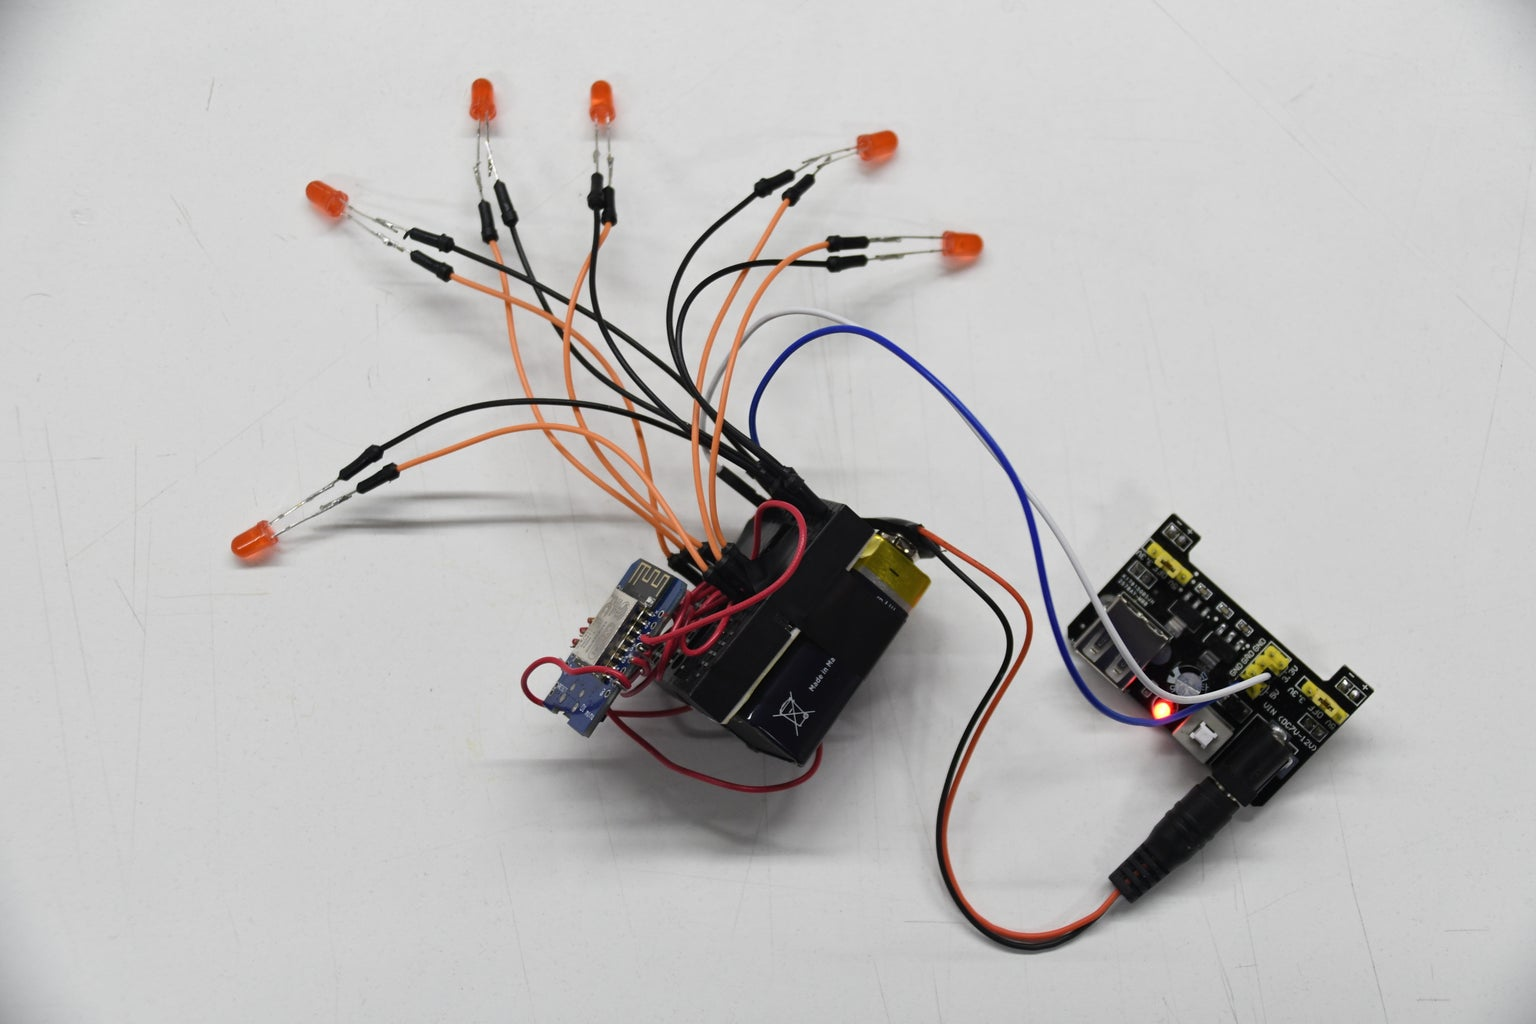 Assembling the Circuits